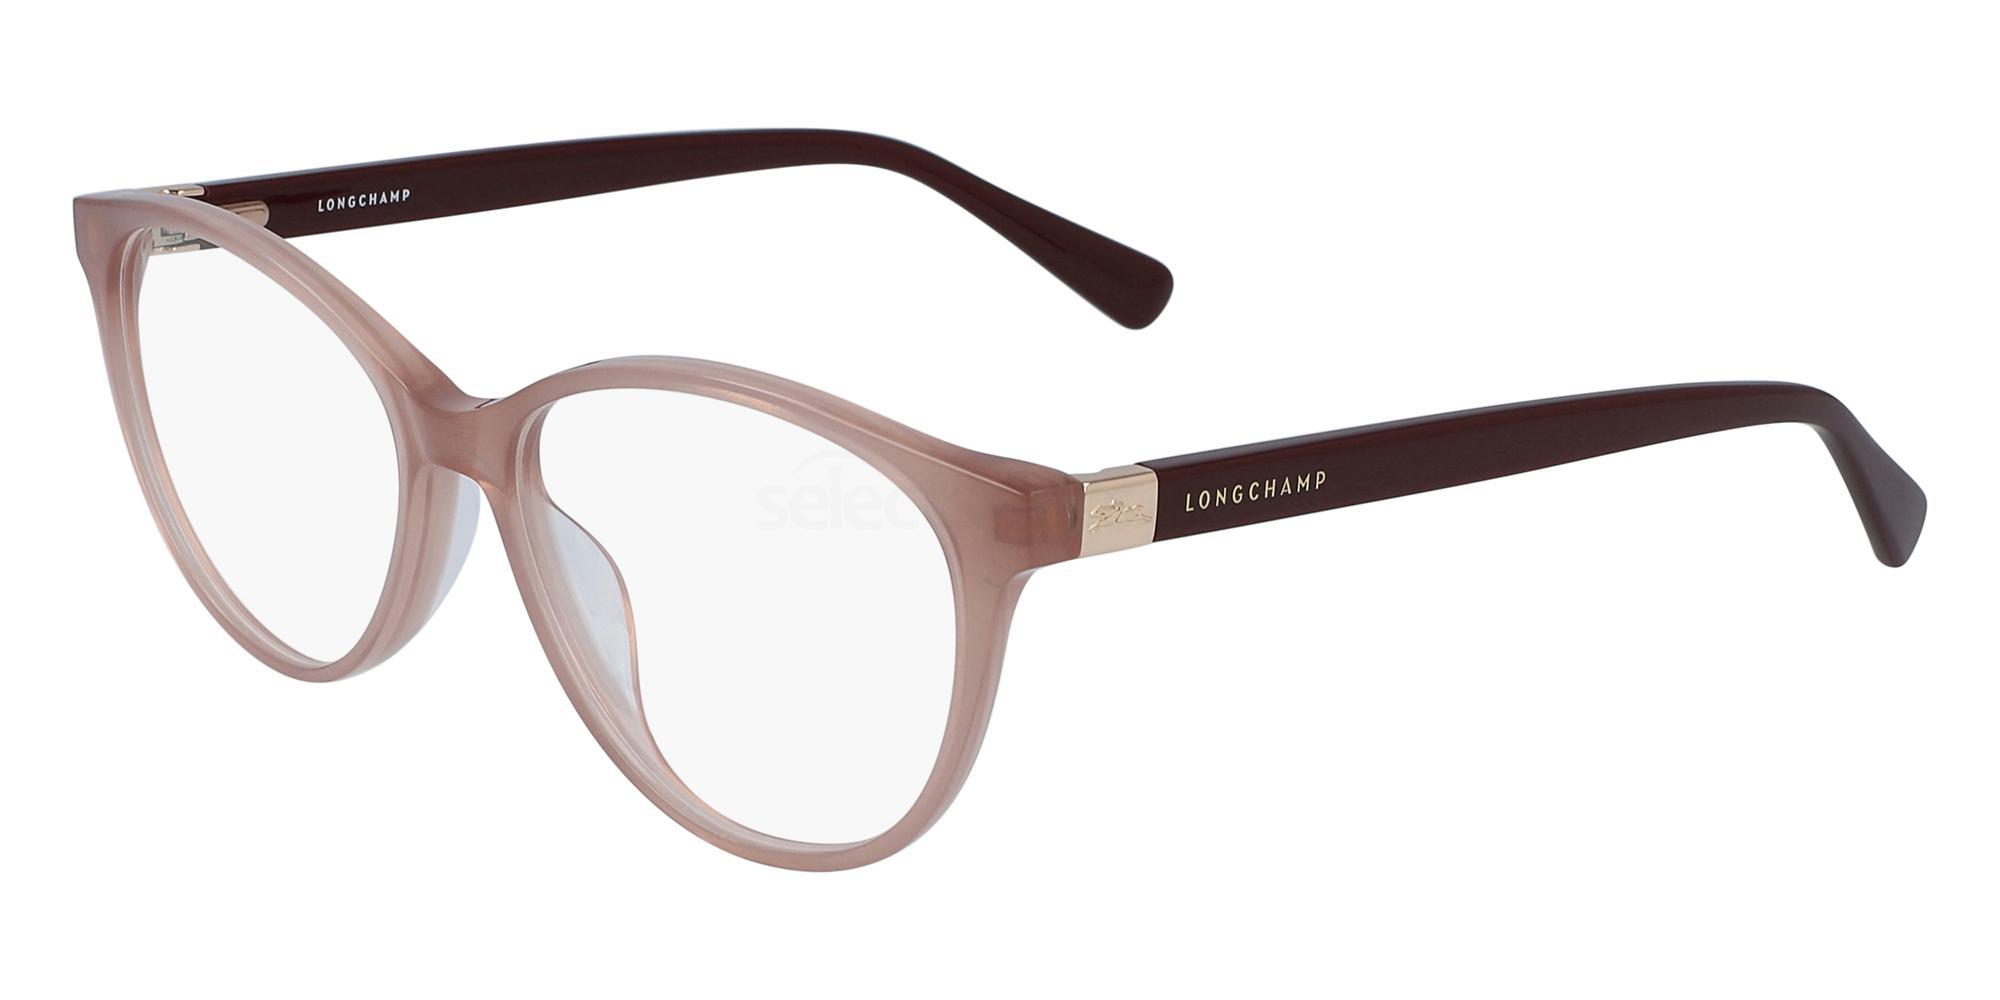 615 LO2648 Glasses, LONGCHAMP